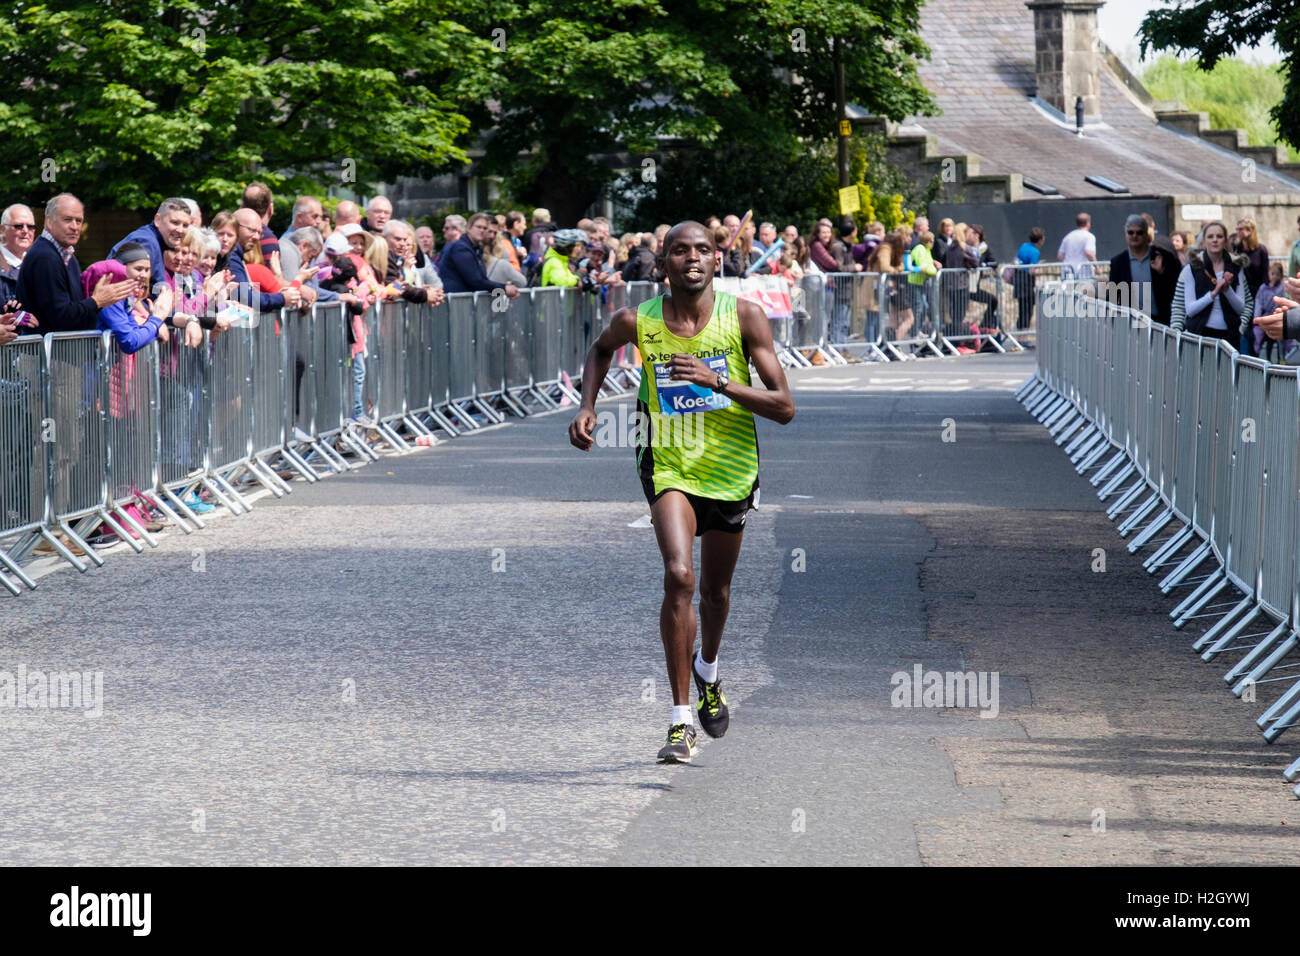 Kenyan runner Japhet Koech runs in 2016 Edinburgh marathon with spectators cheering him into 3rd place. Musselburgh - Stock Image